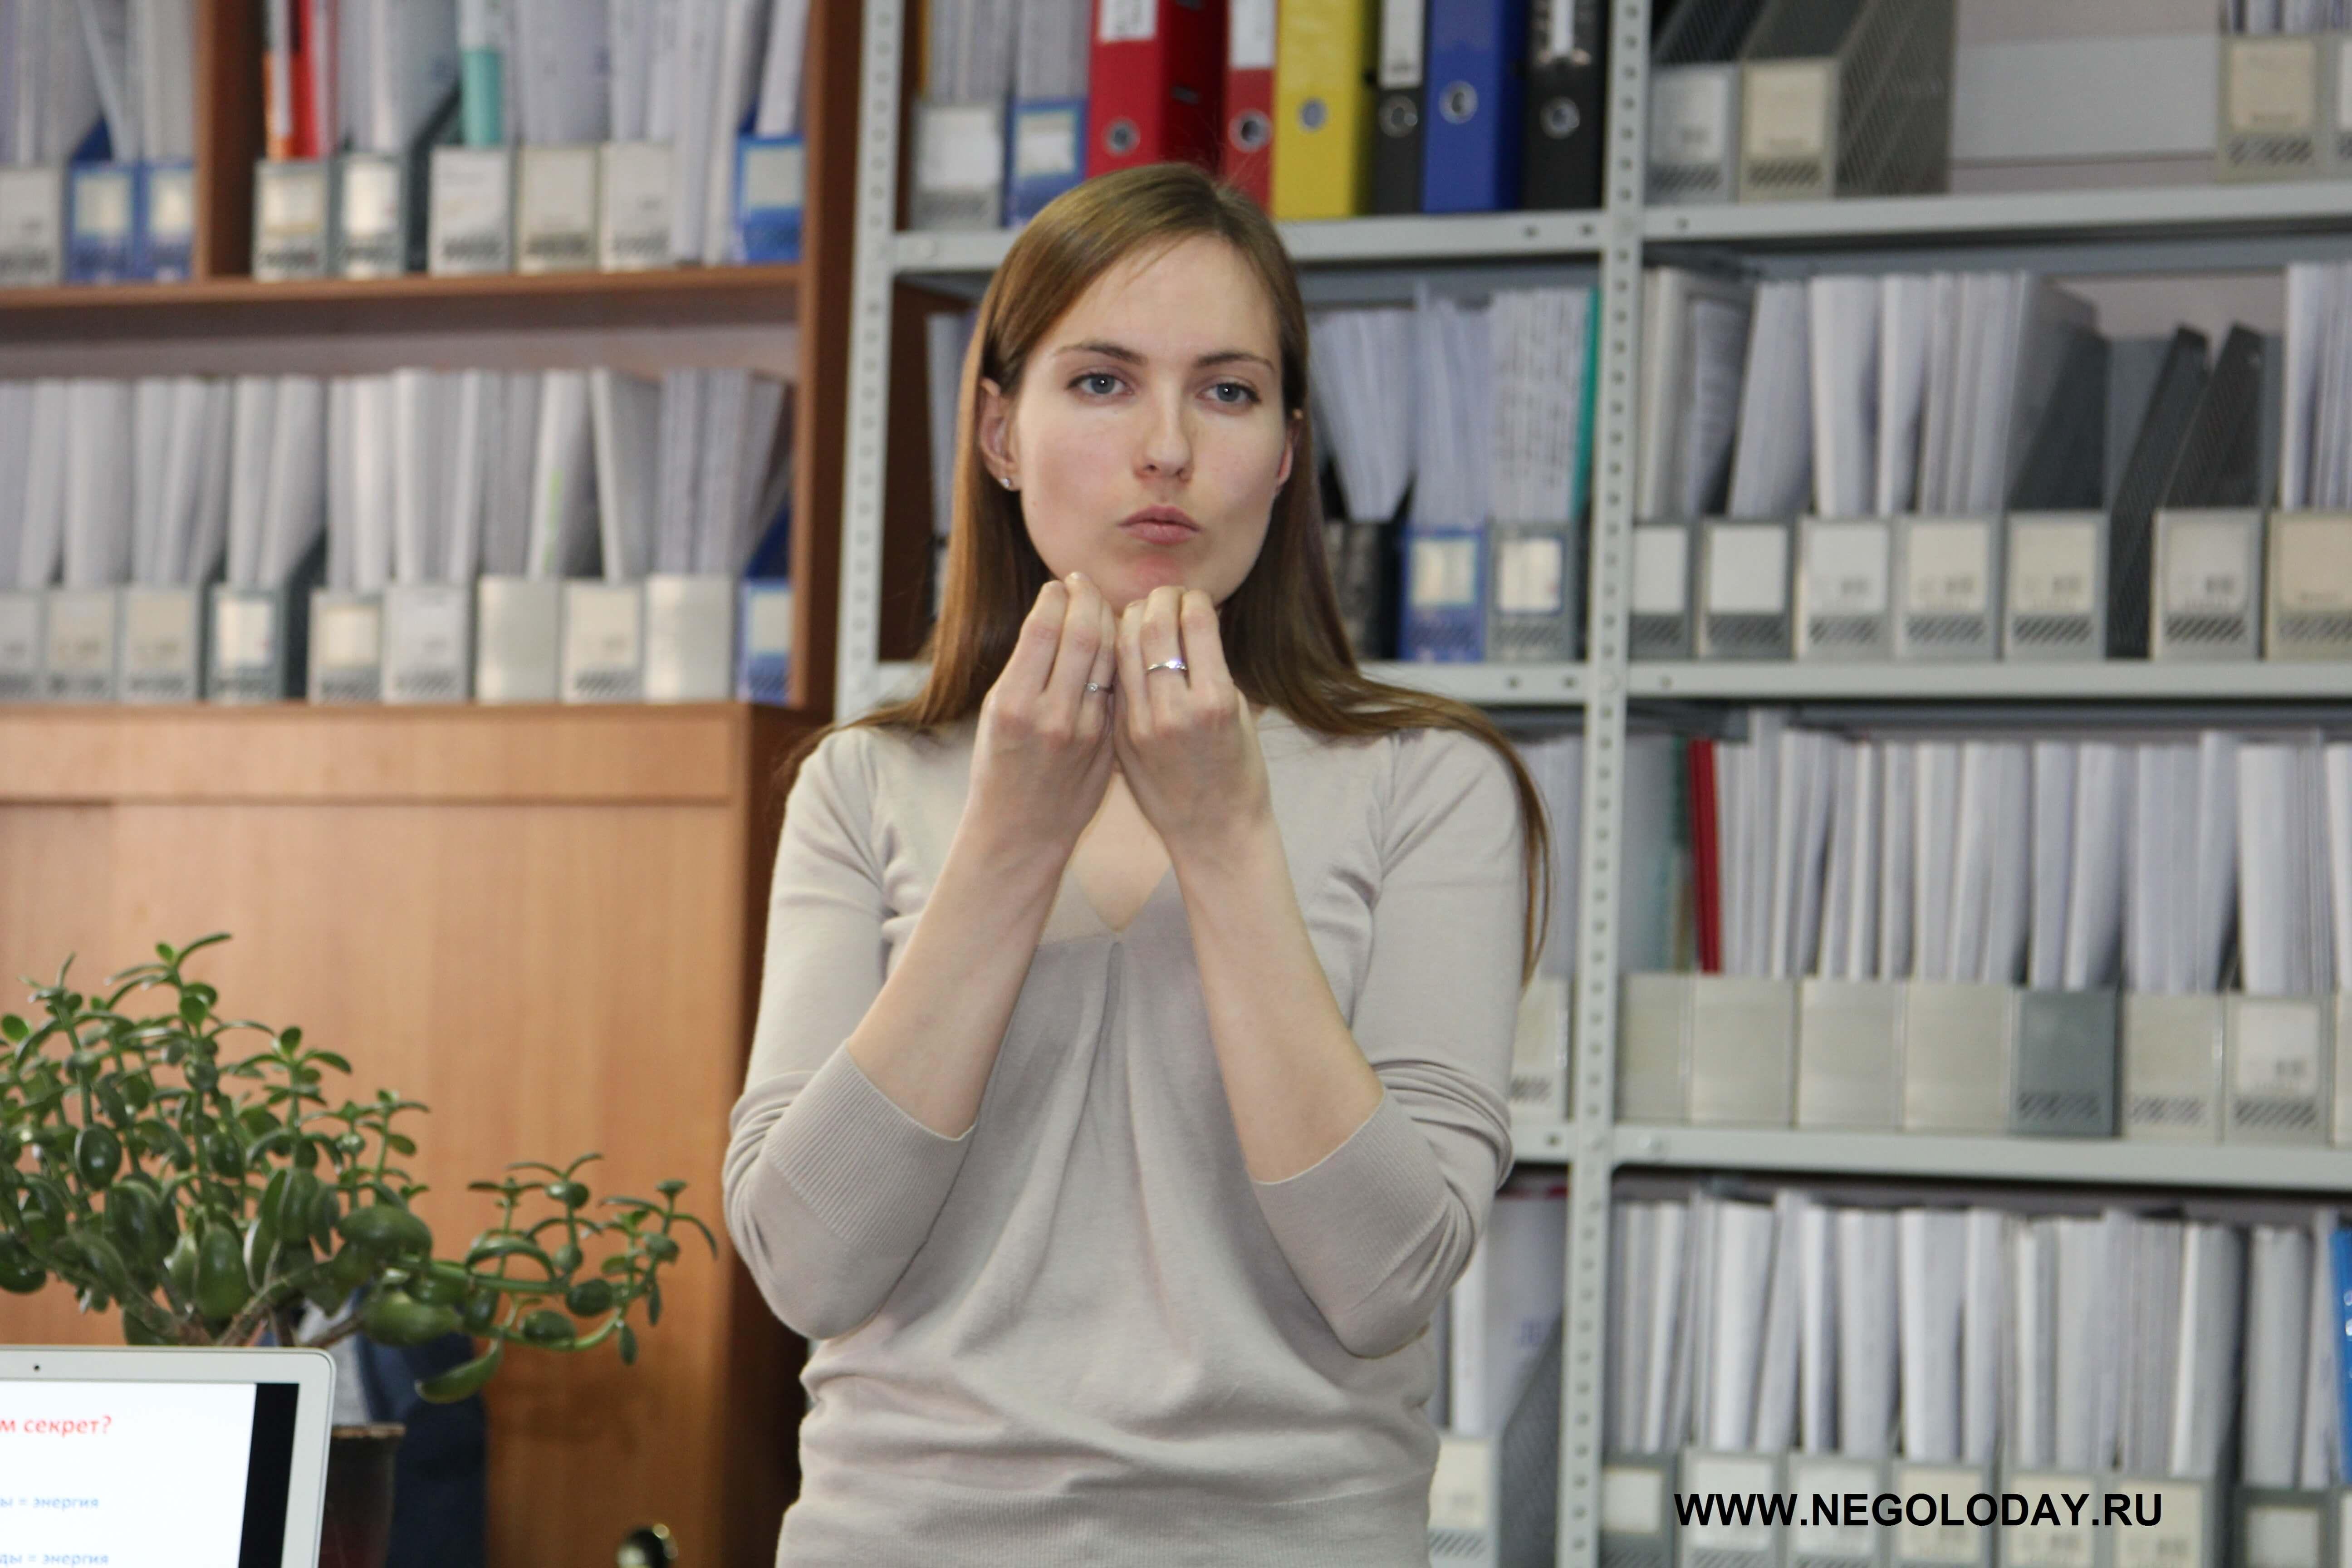 Ольга Деккер Семинар центра лечебного питания WWW.NEGOLODAY.RU